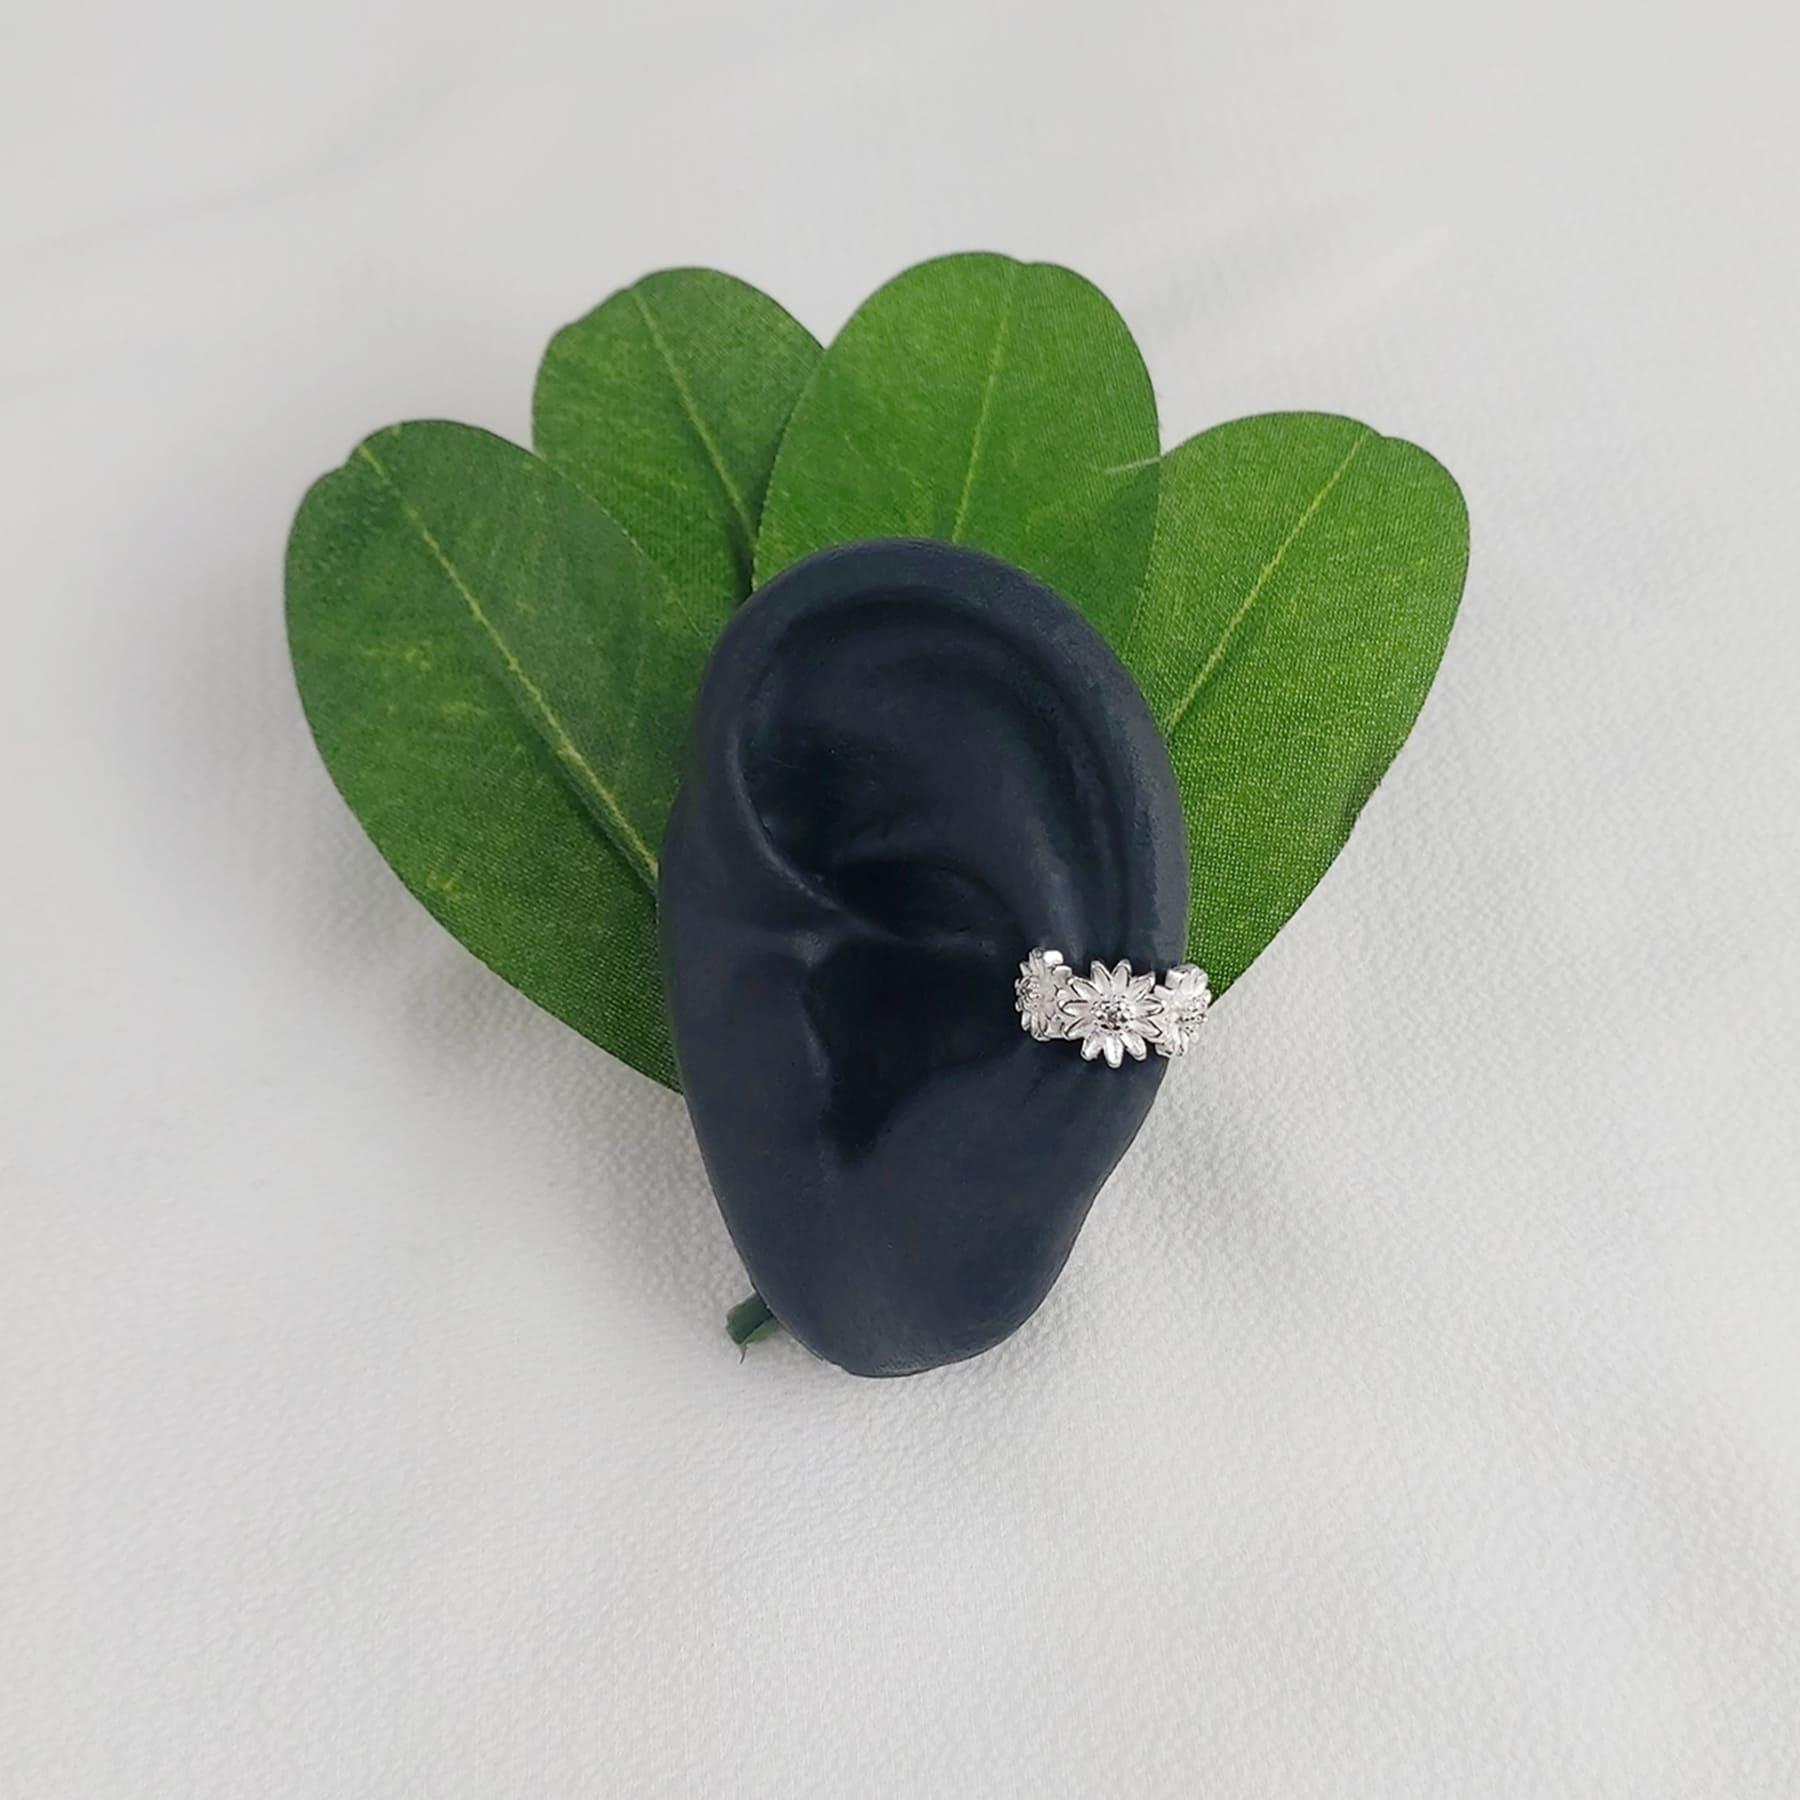 Piercing Fake Prata Girassol - Natureza